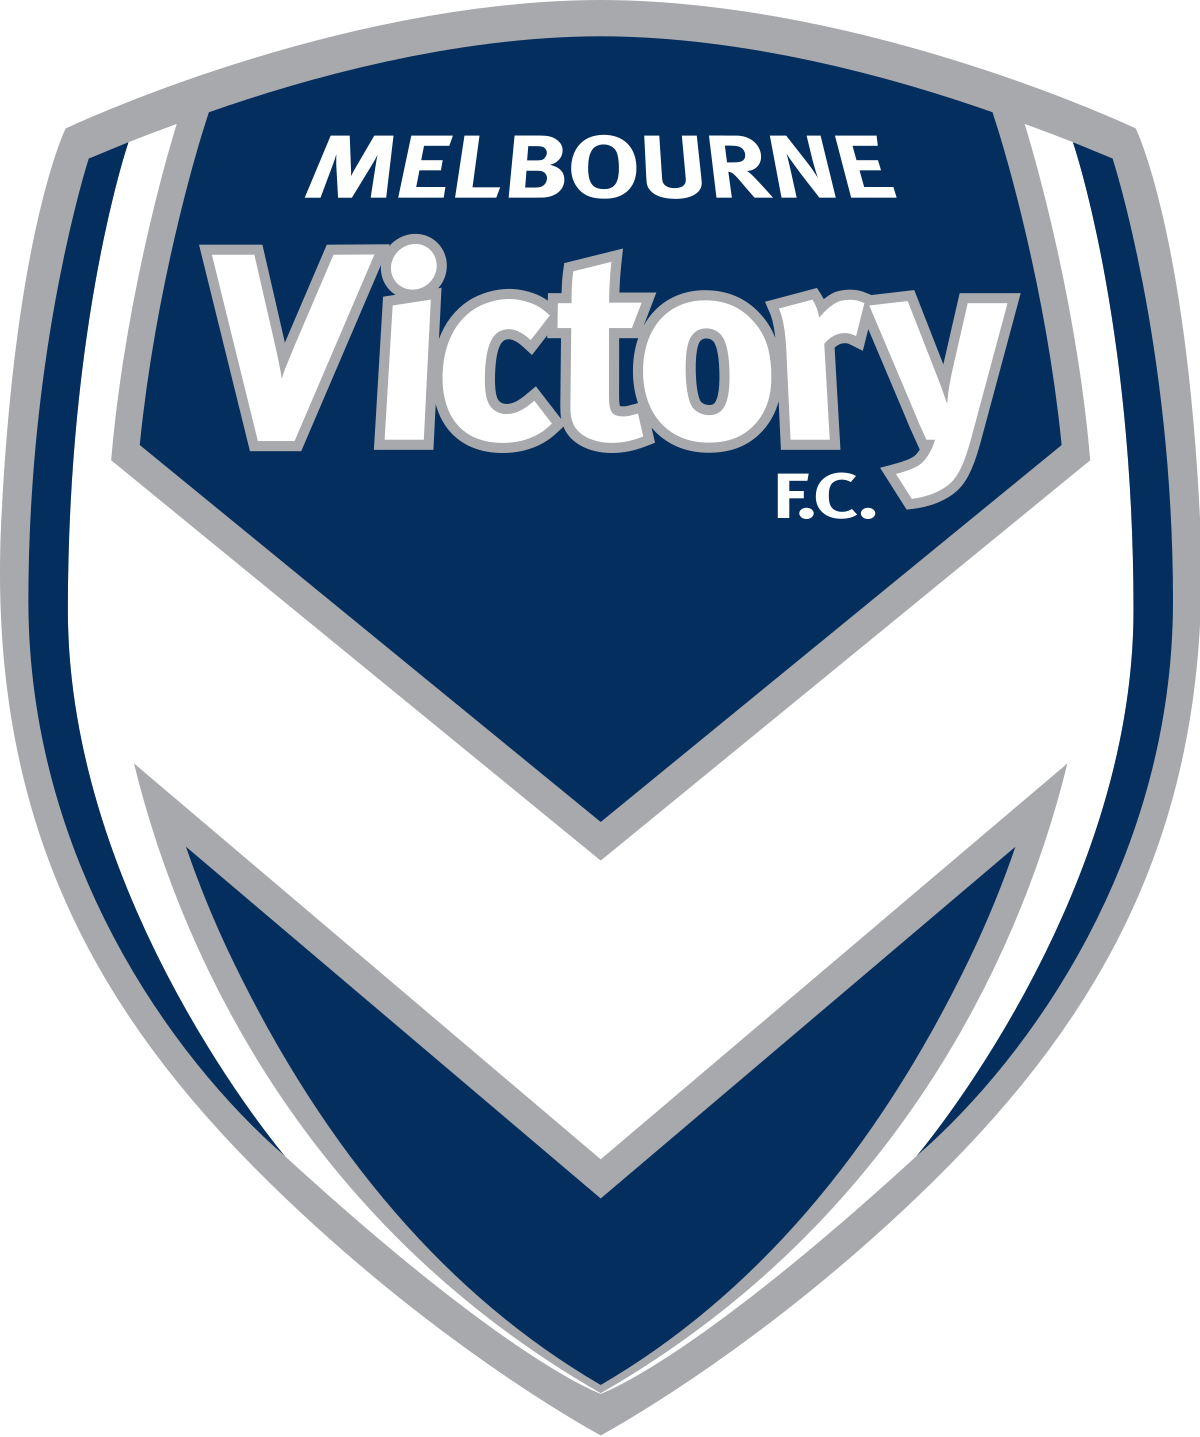 Melbourne Victory W logo